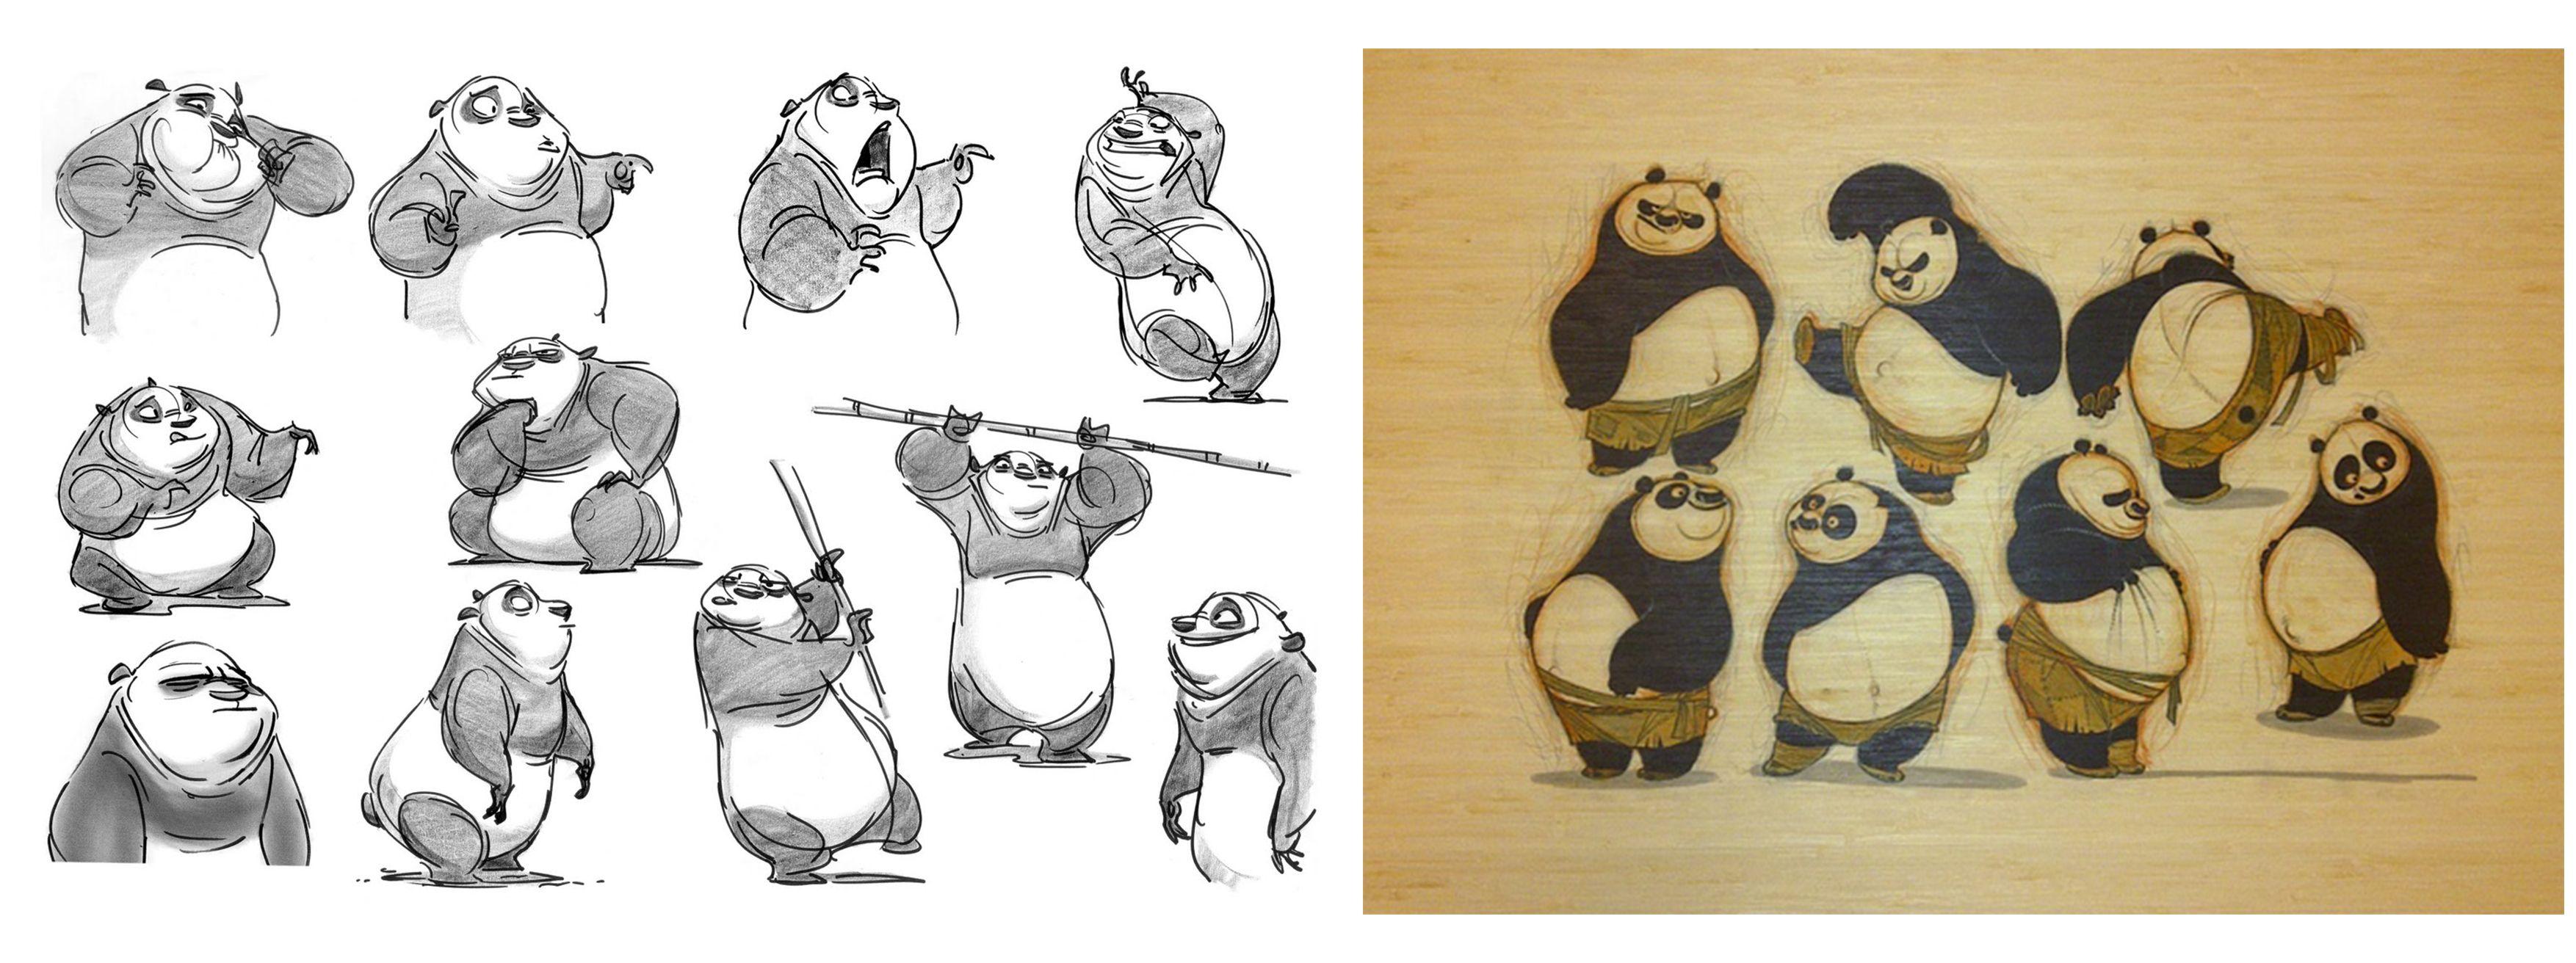 kung fu panda character designer - Google Search